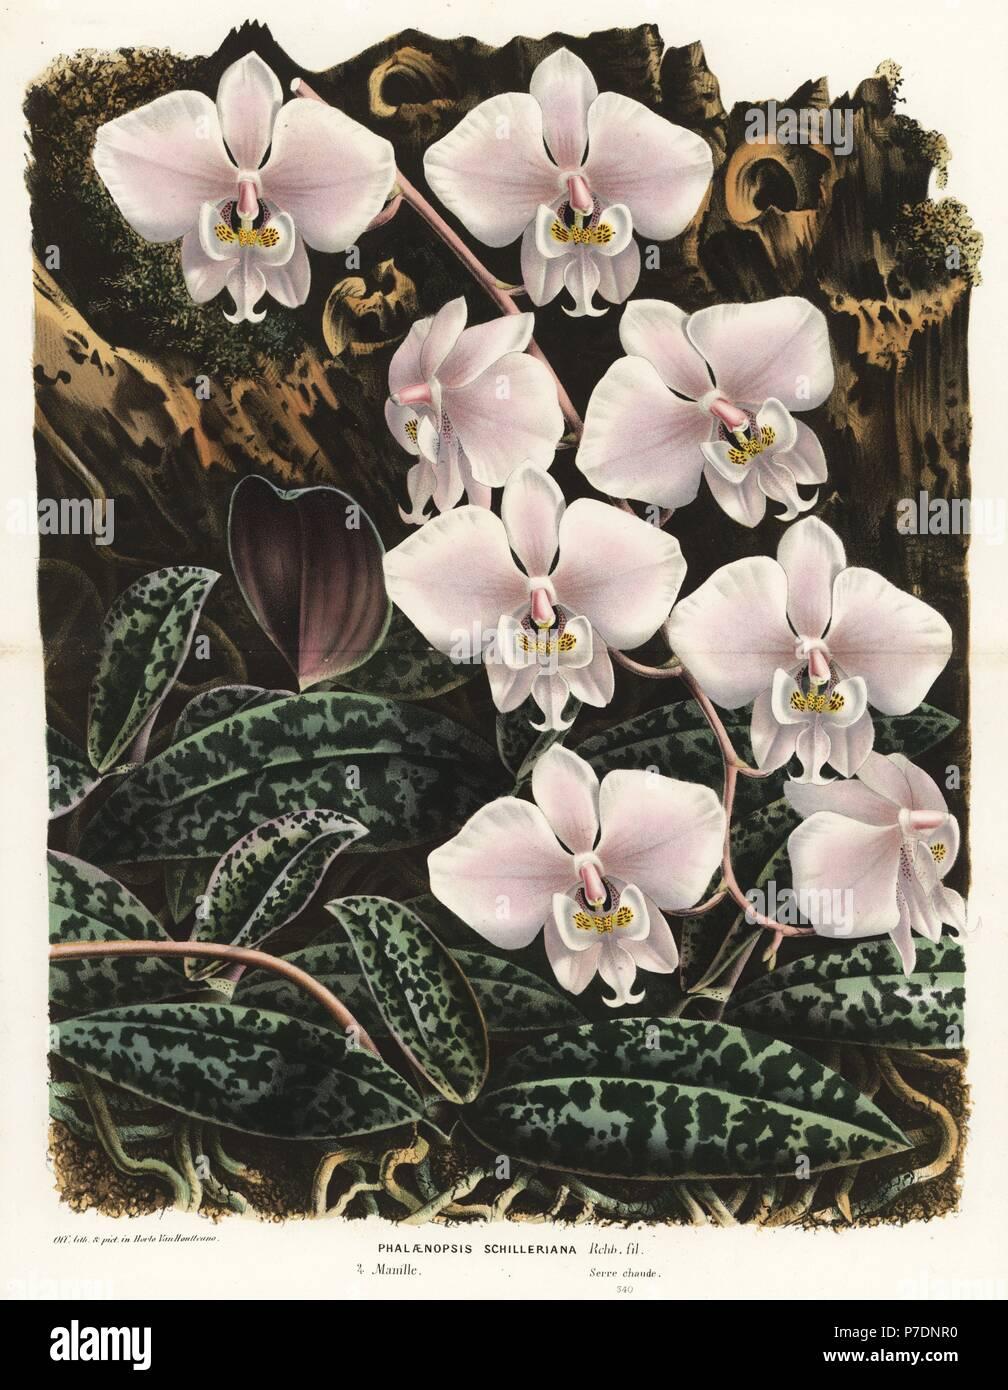 Motte Orchidee, Phalaenopsis Schilleriana. Handkoloriert ...